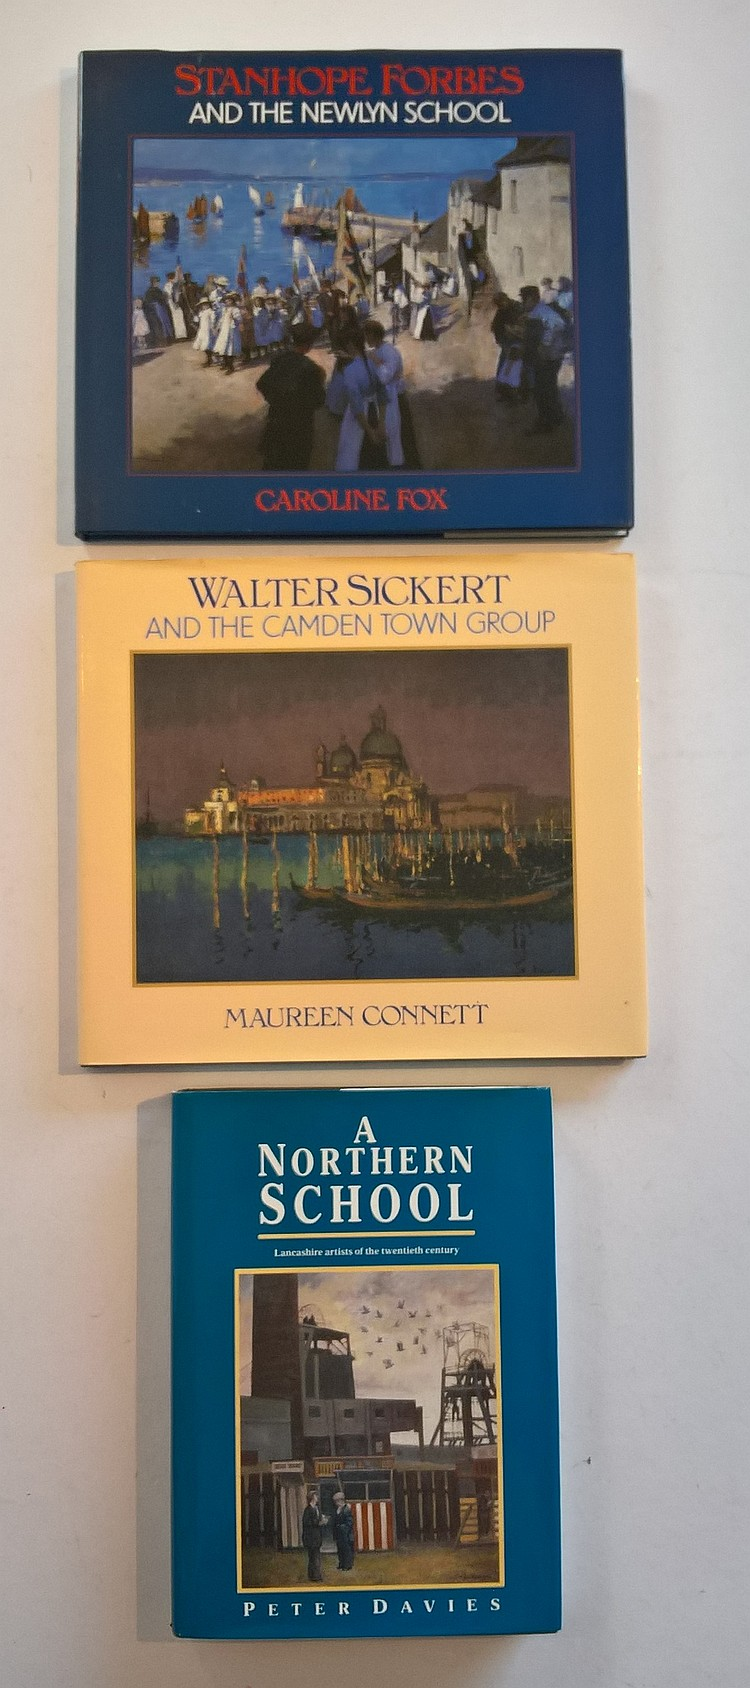 Art School Books (3) - Walter Sickert and the Camd